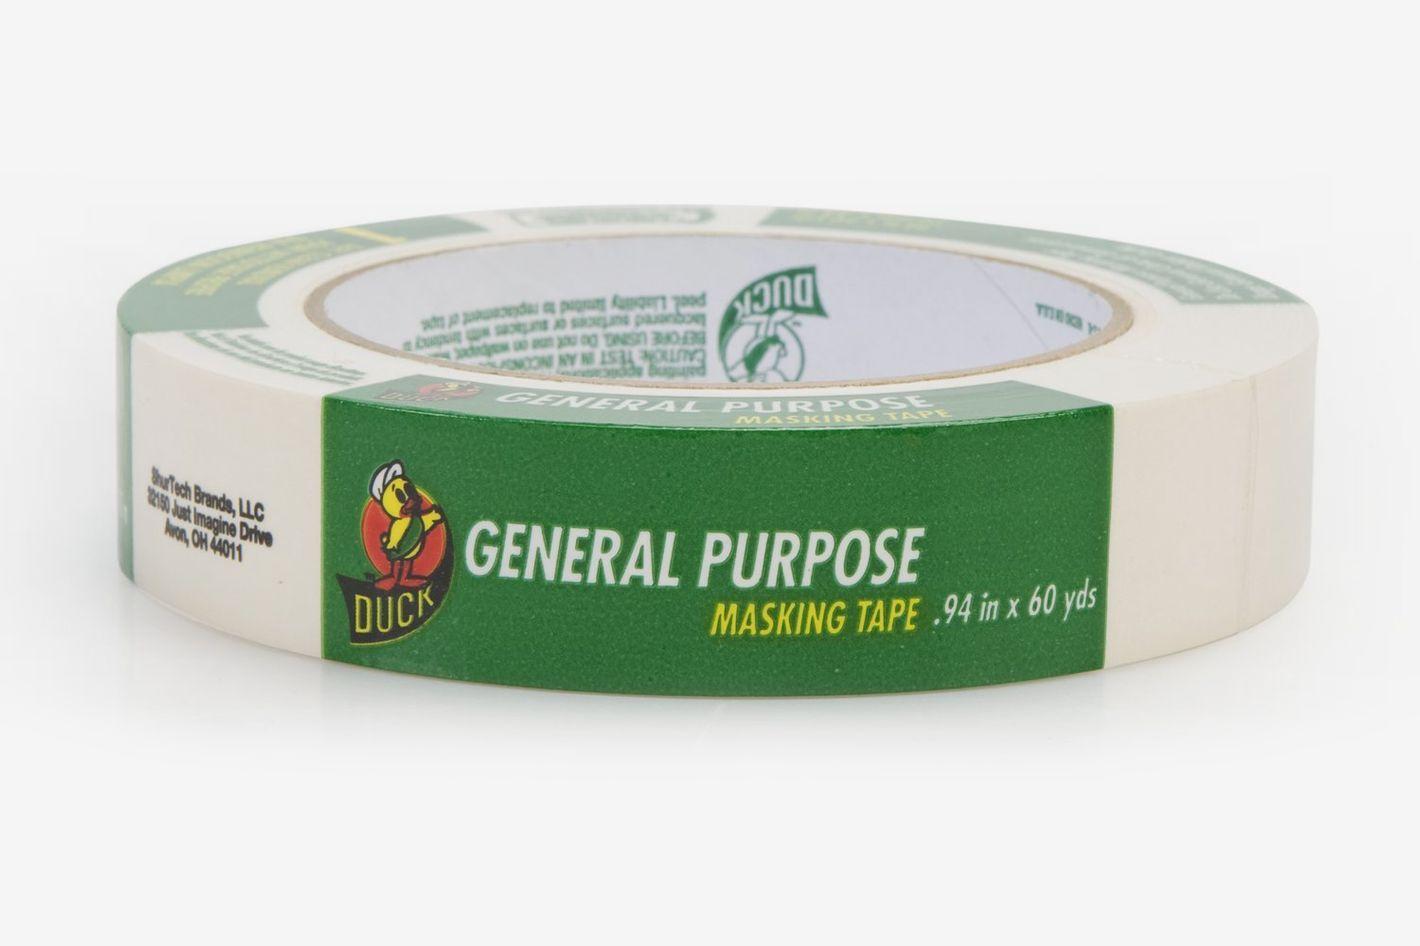 Duck Brand 394693 General Purpose Masking Tape